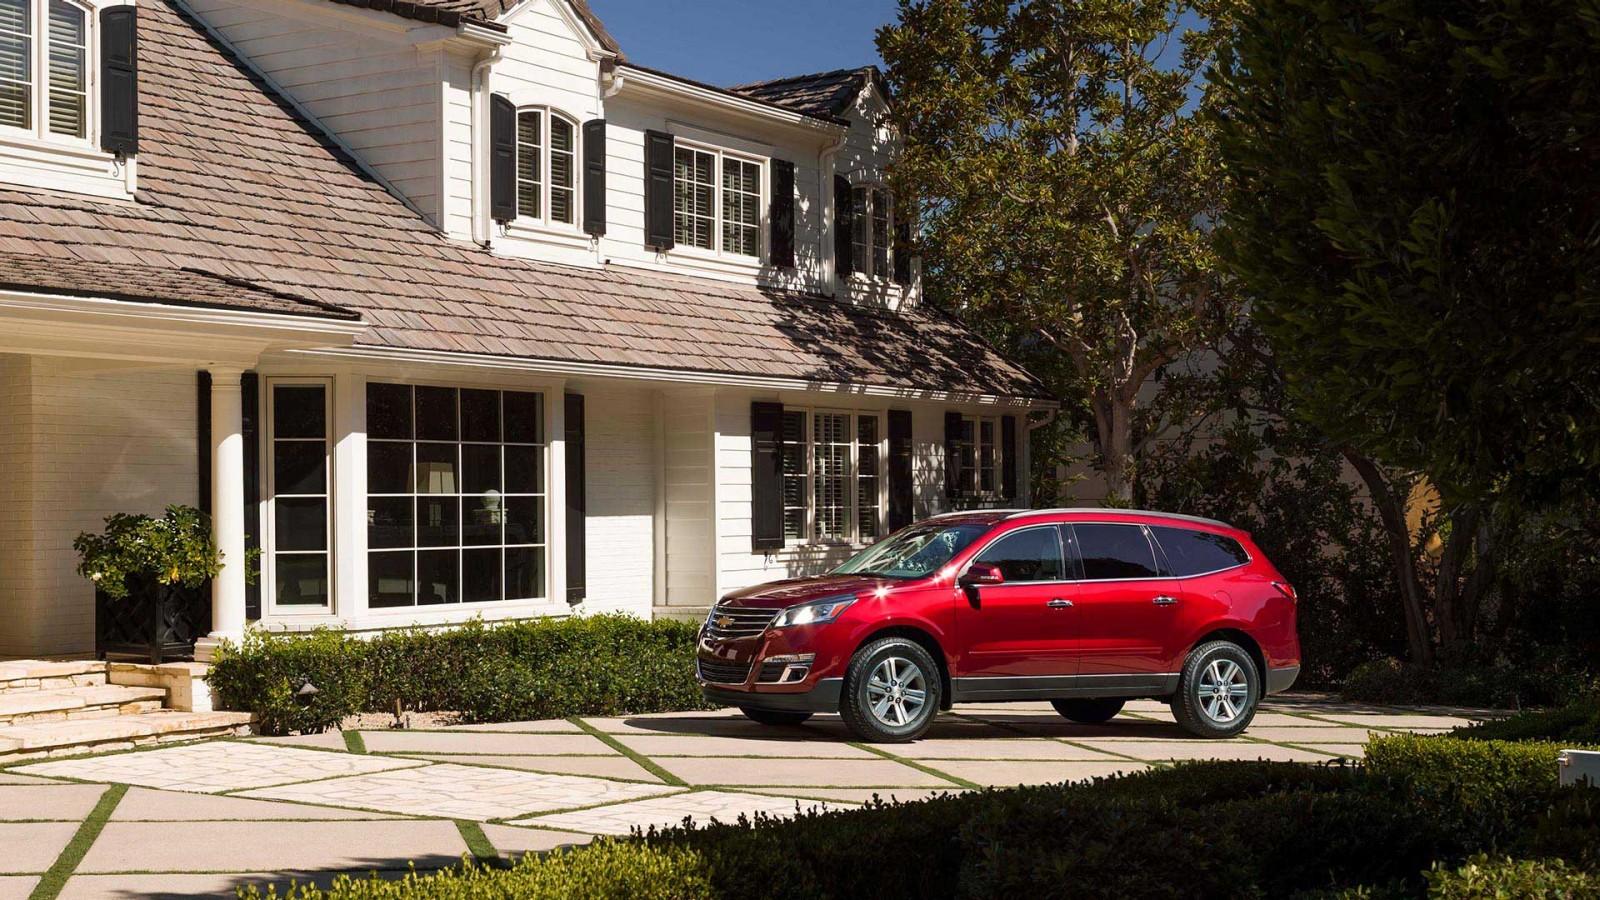 New Chevrolet Traverse Exterior image 2